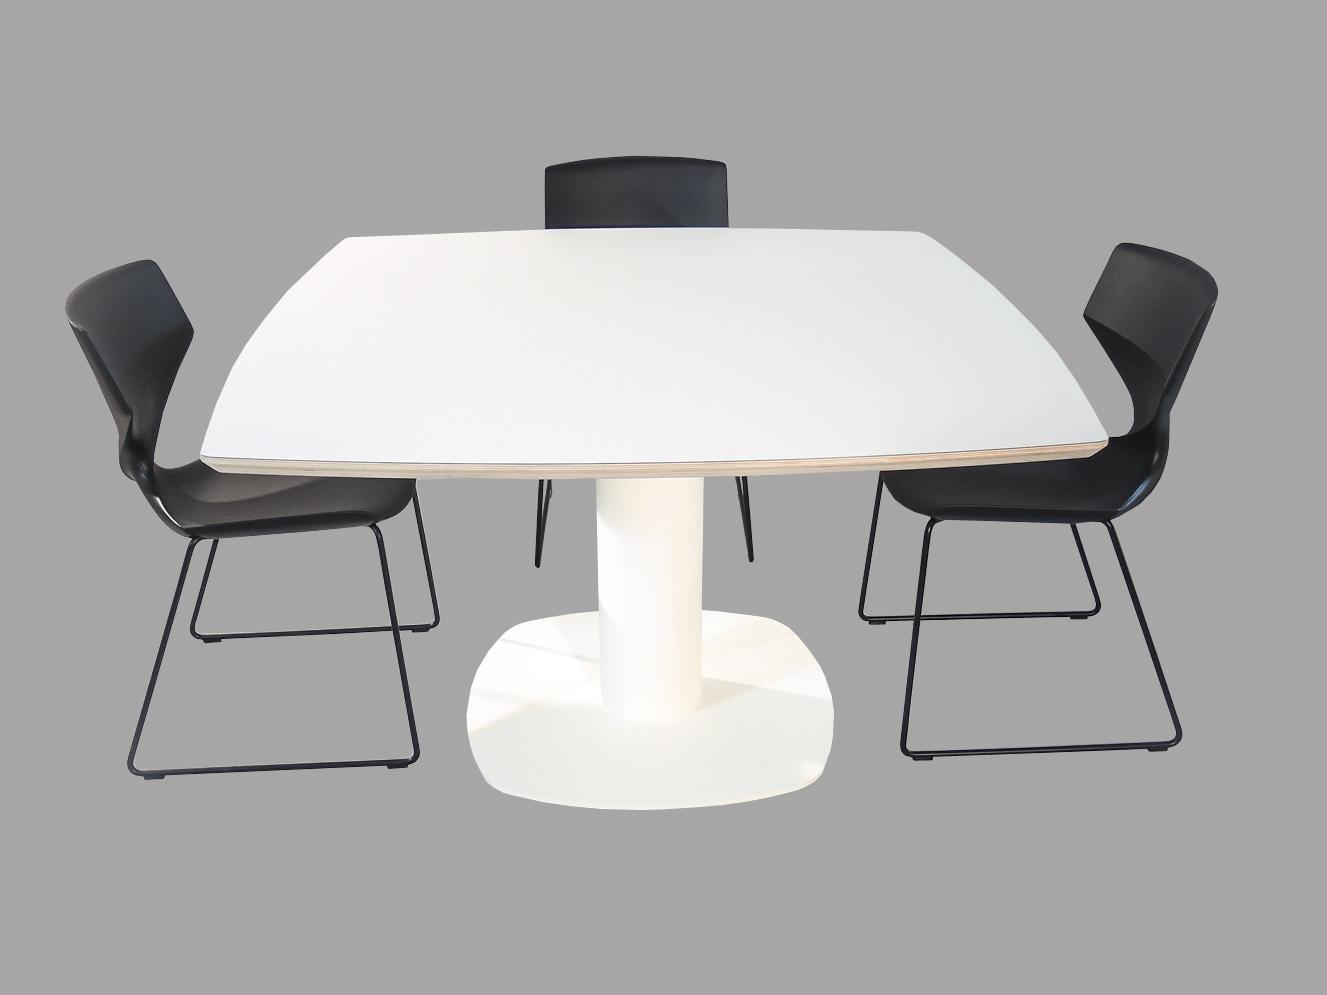 Design Vierkante Eettafel.Empoli Design Fenix Witte Eettafel